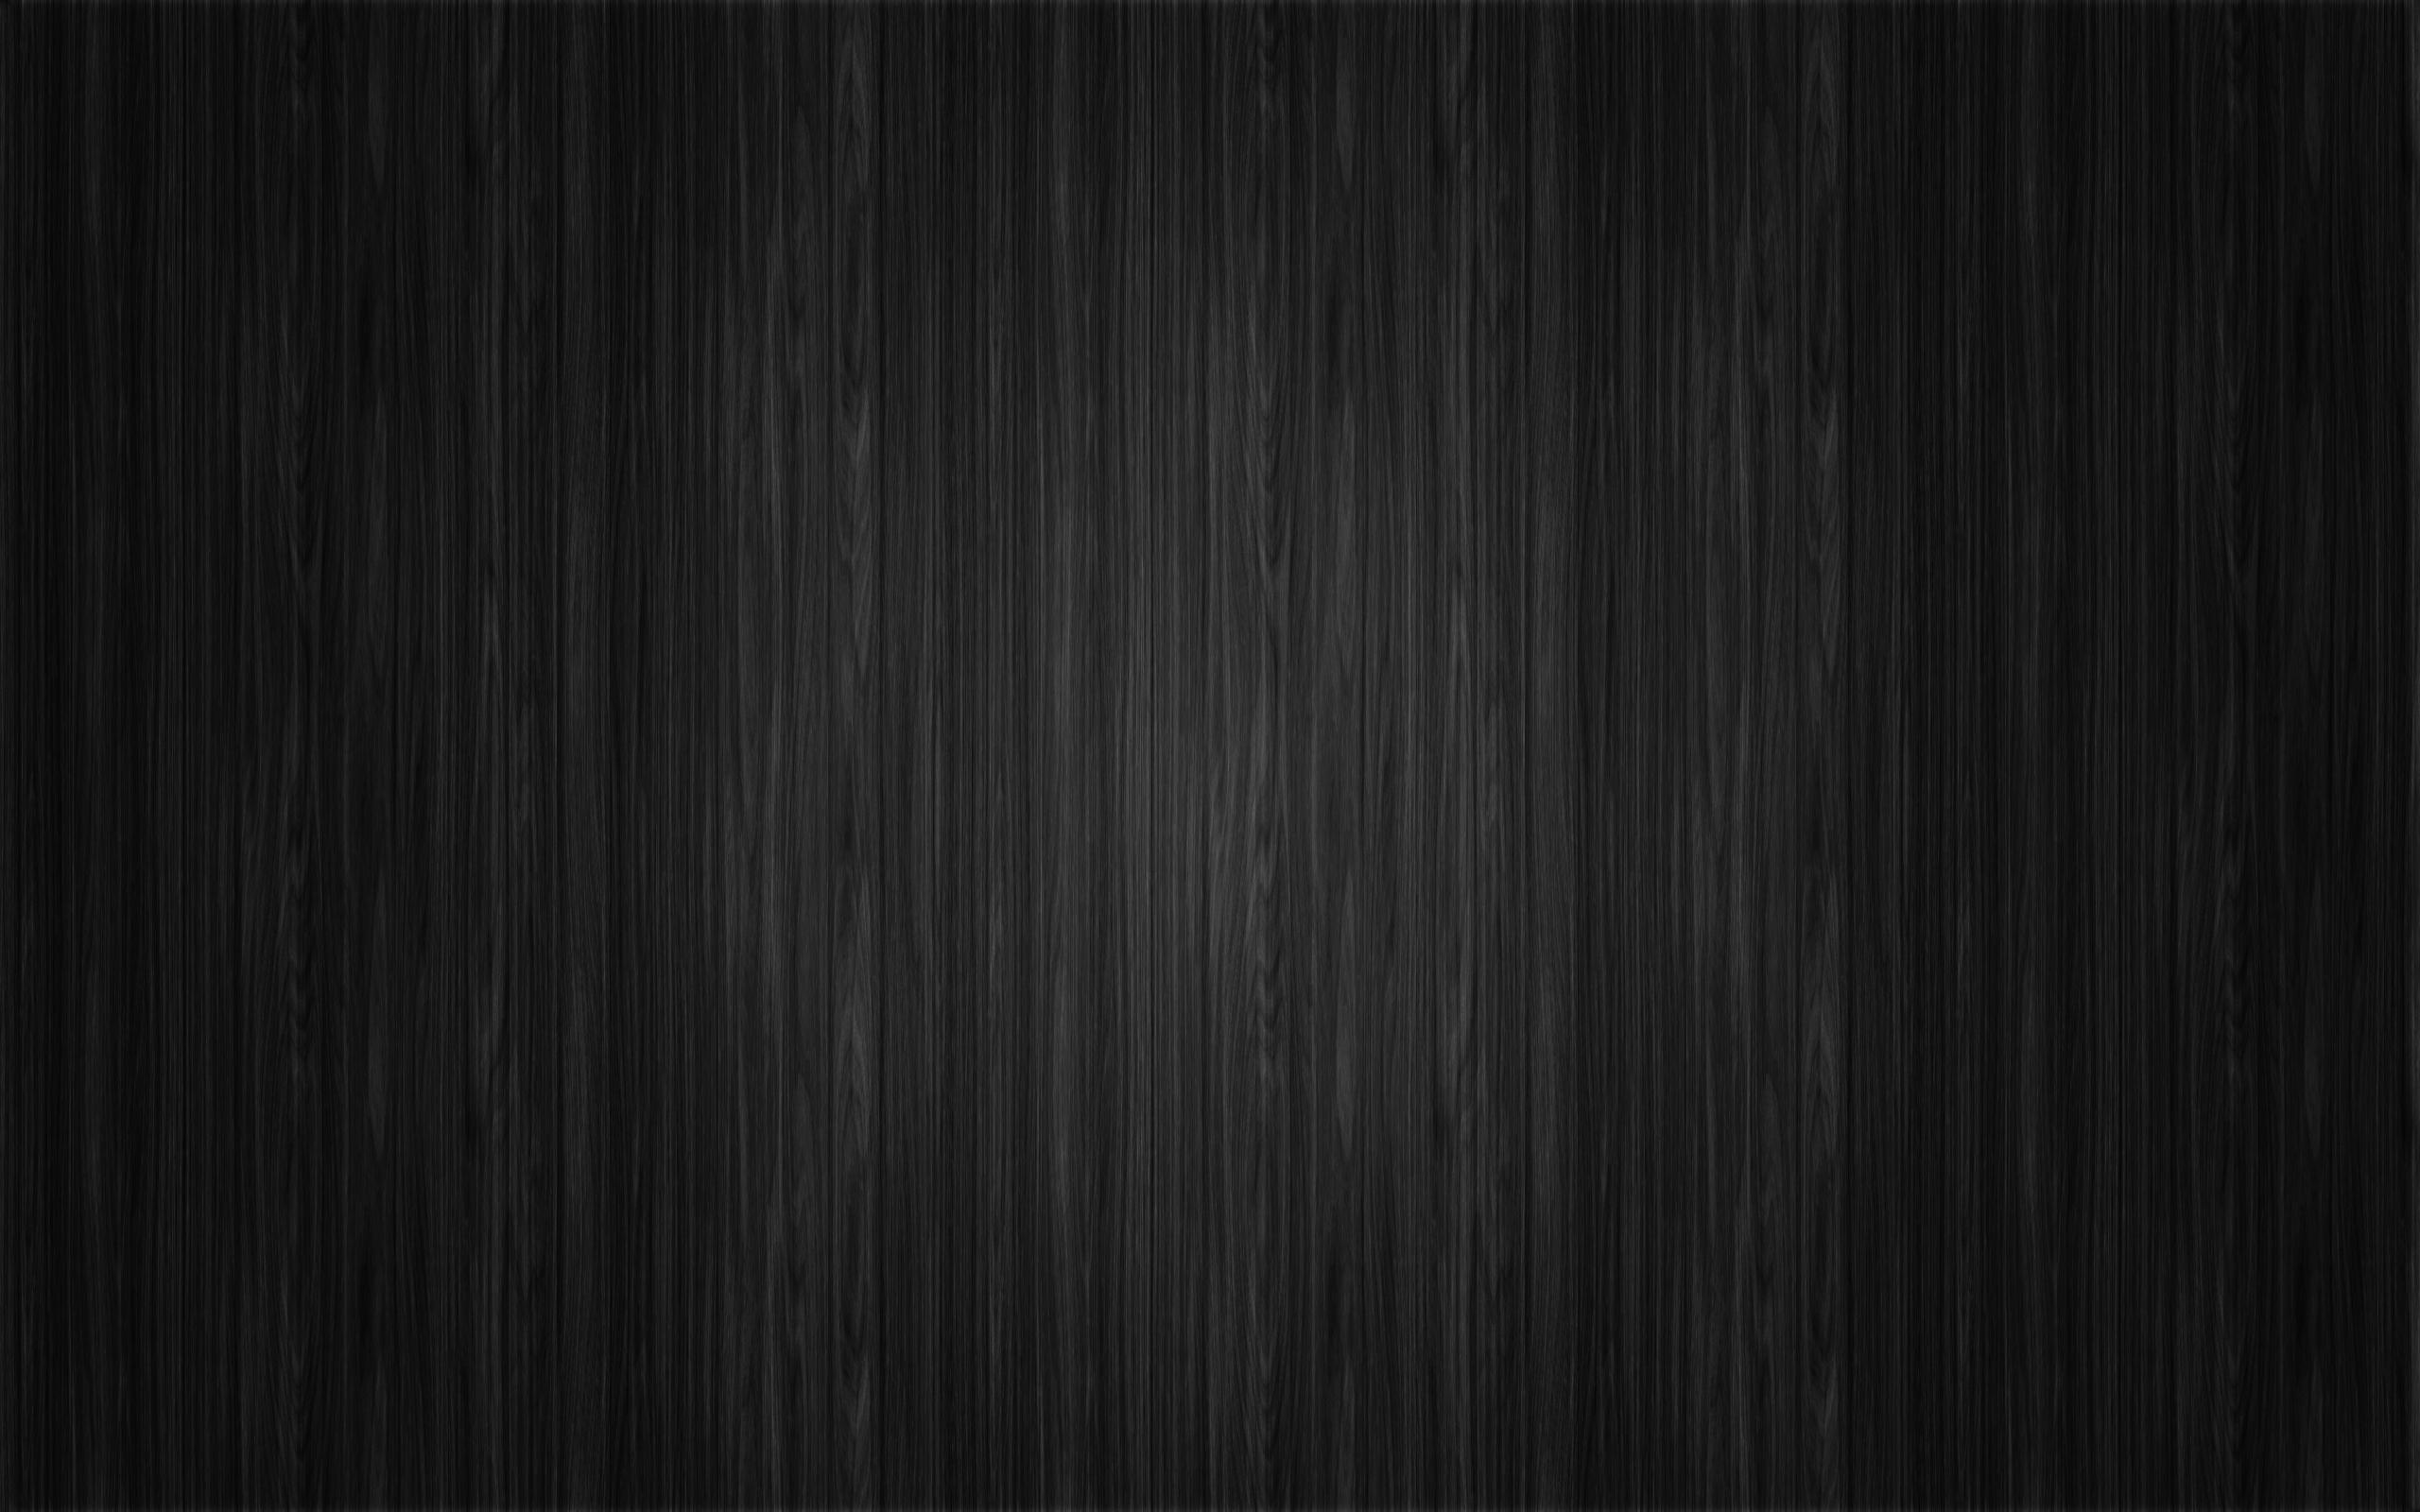 Black 3d Wallpaper 128 HD Wallpaper 3D Desktop Backgrounds 2560x1600